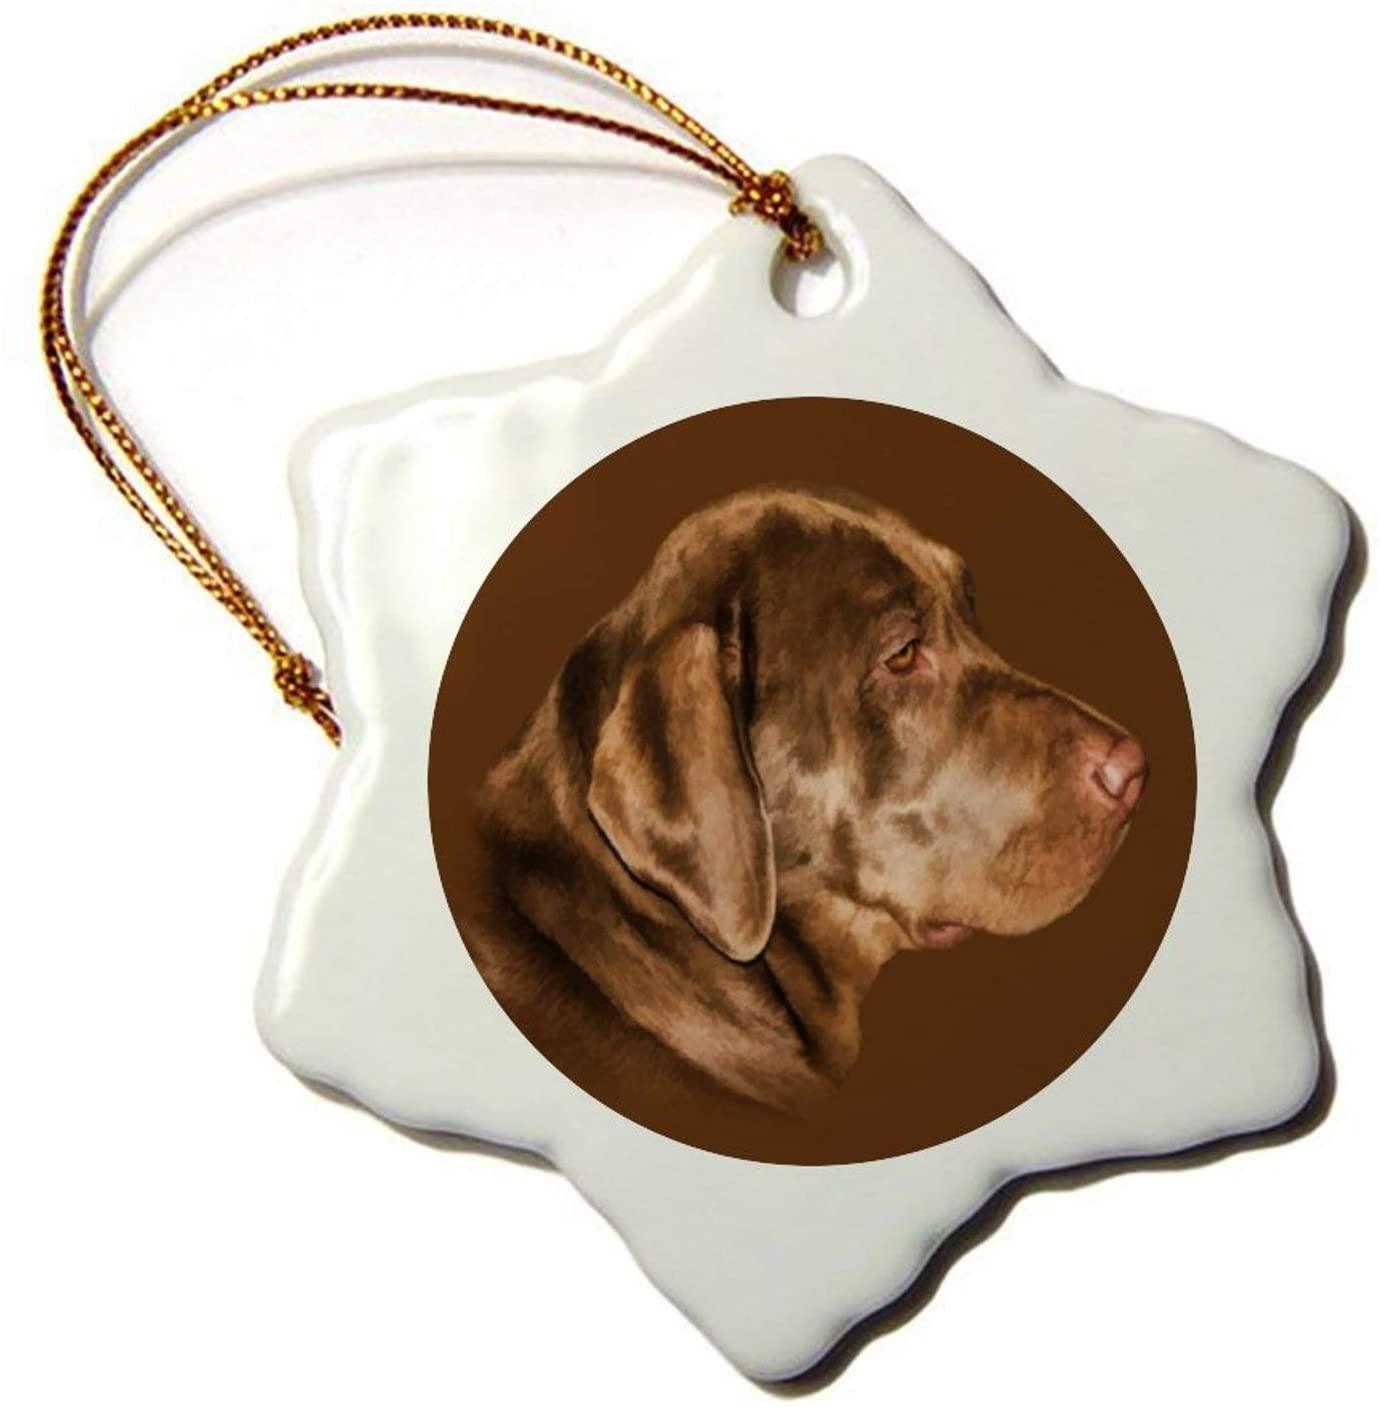 Christmas Snowflake Ornaments, Labrador Retriever Dog Christmas Tree Ornament, Hanging Decor Gift for Families Friends,3 Inch